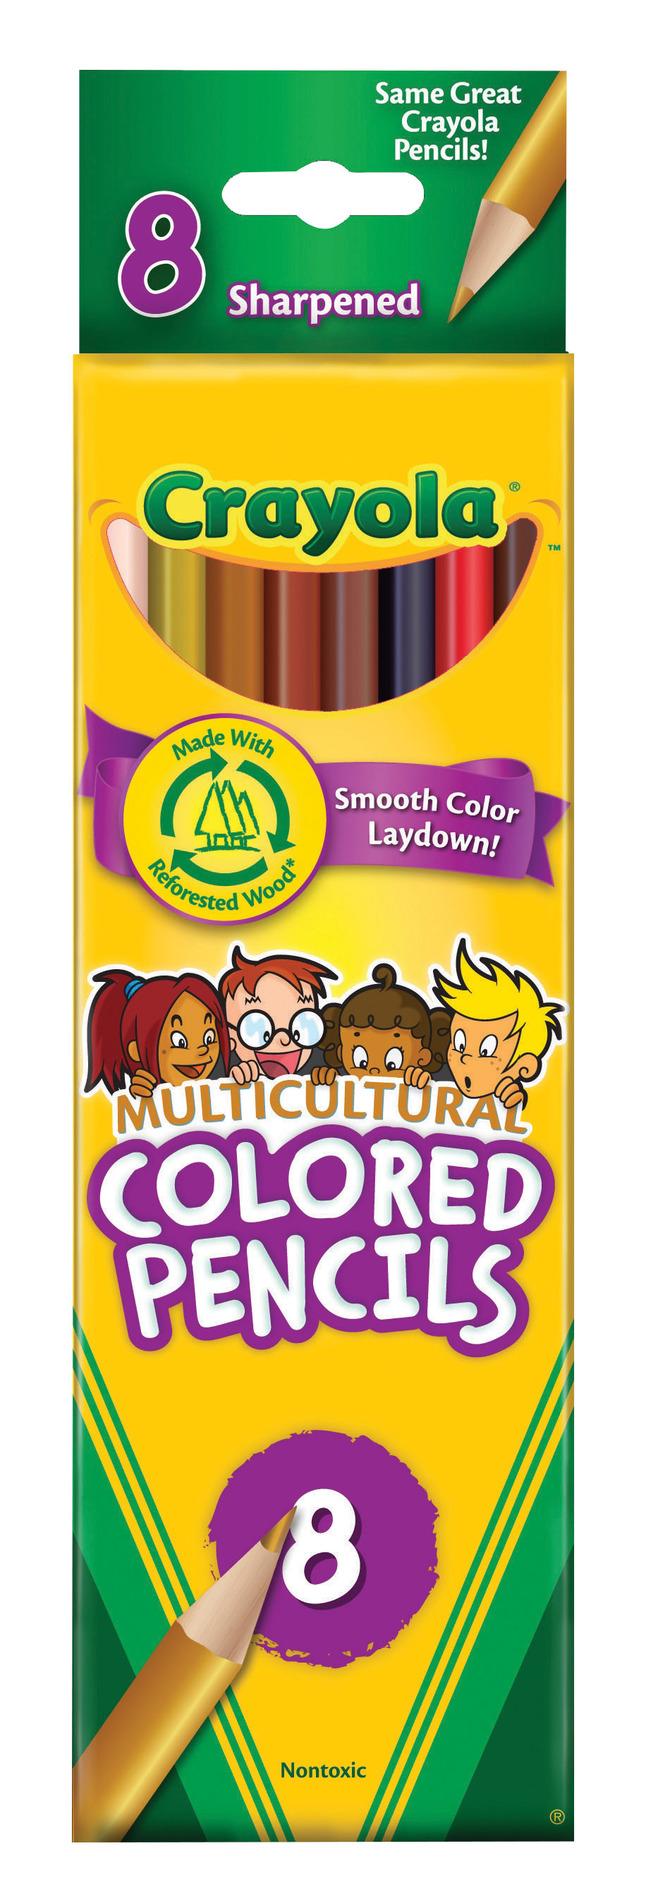 Colored Pencils, Item Number 391163